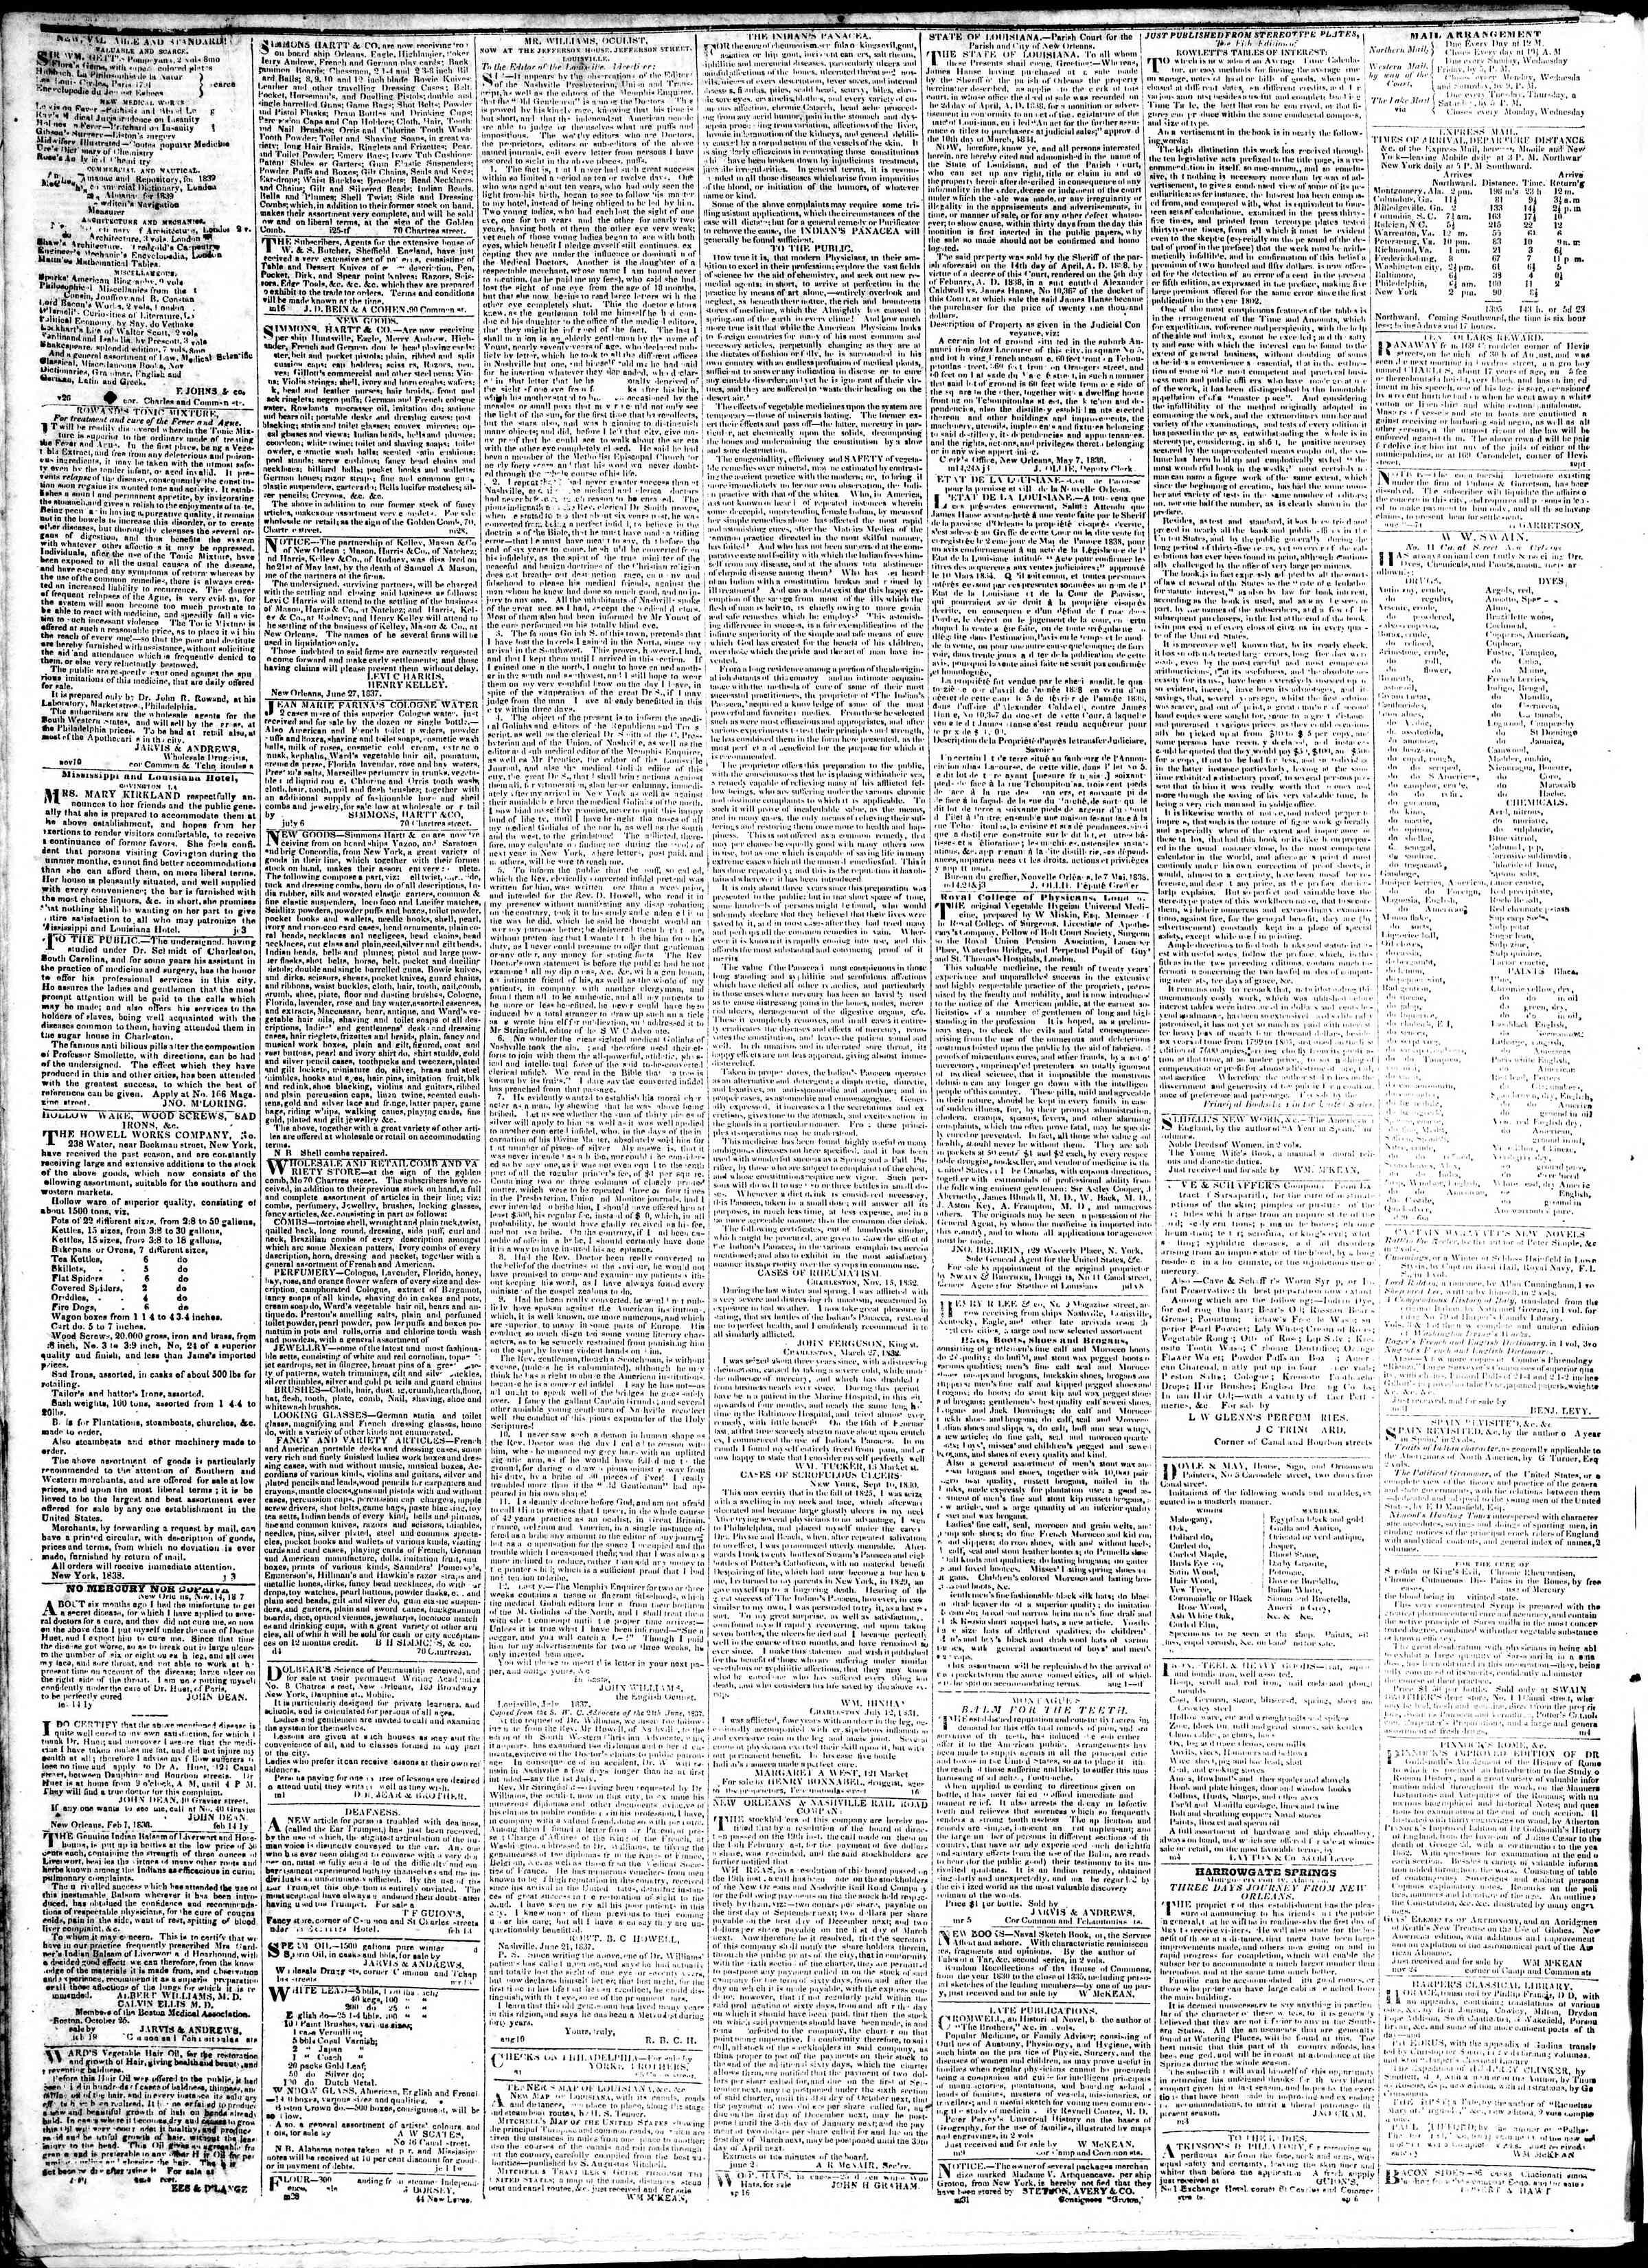 January 24, 1839 Tarihli True American Gazetesi Sayfa 4